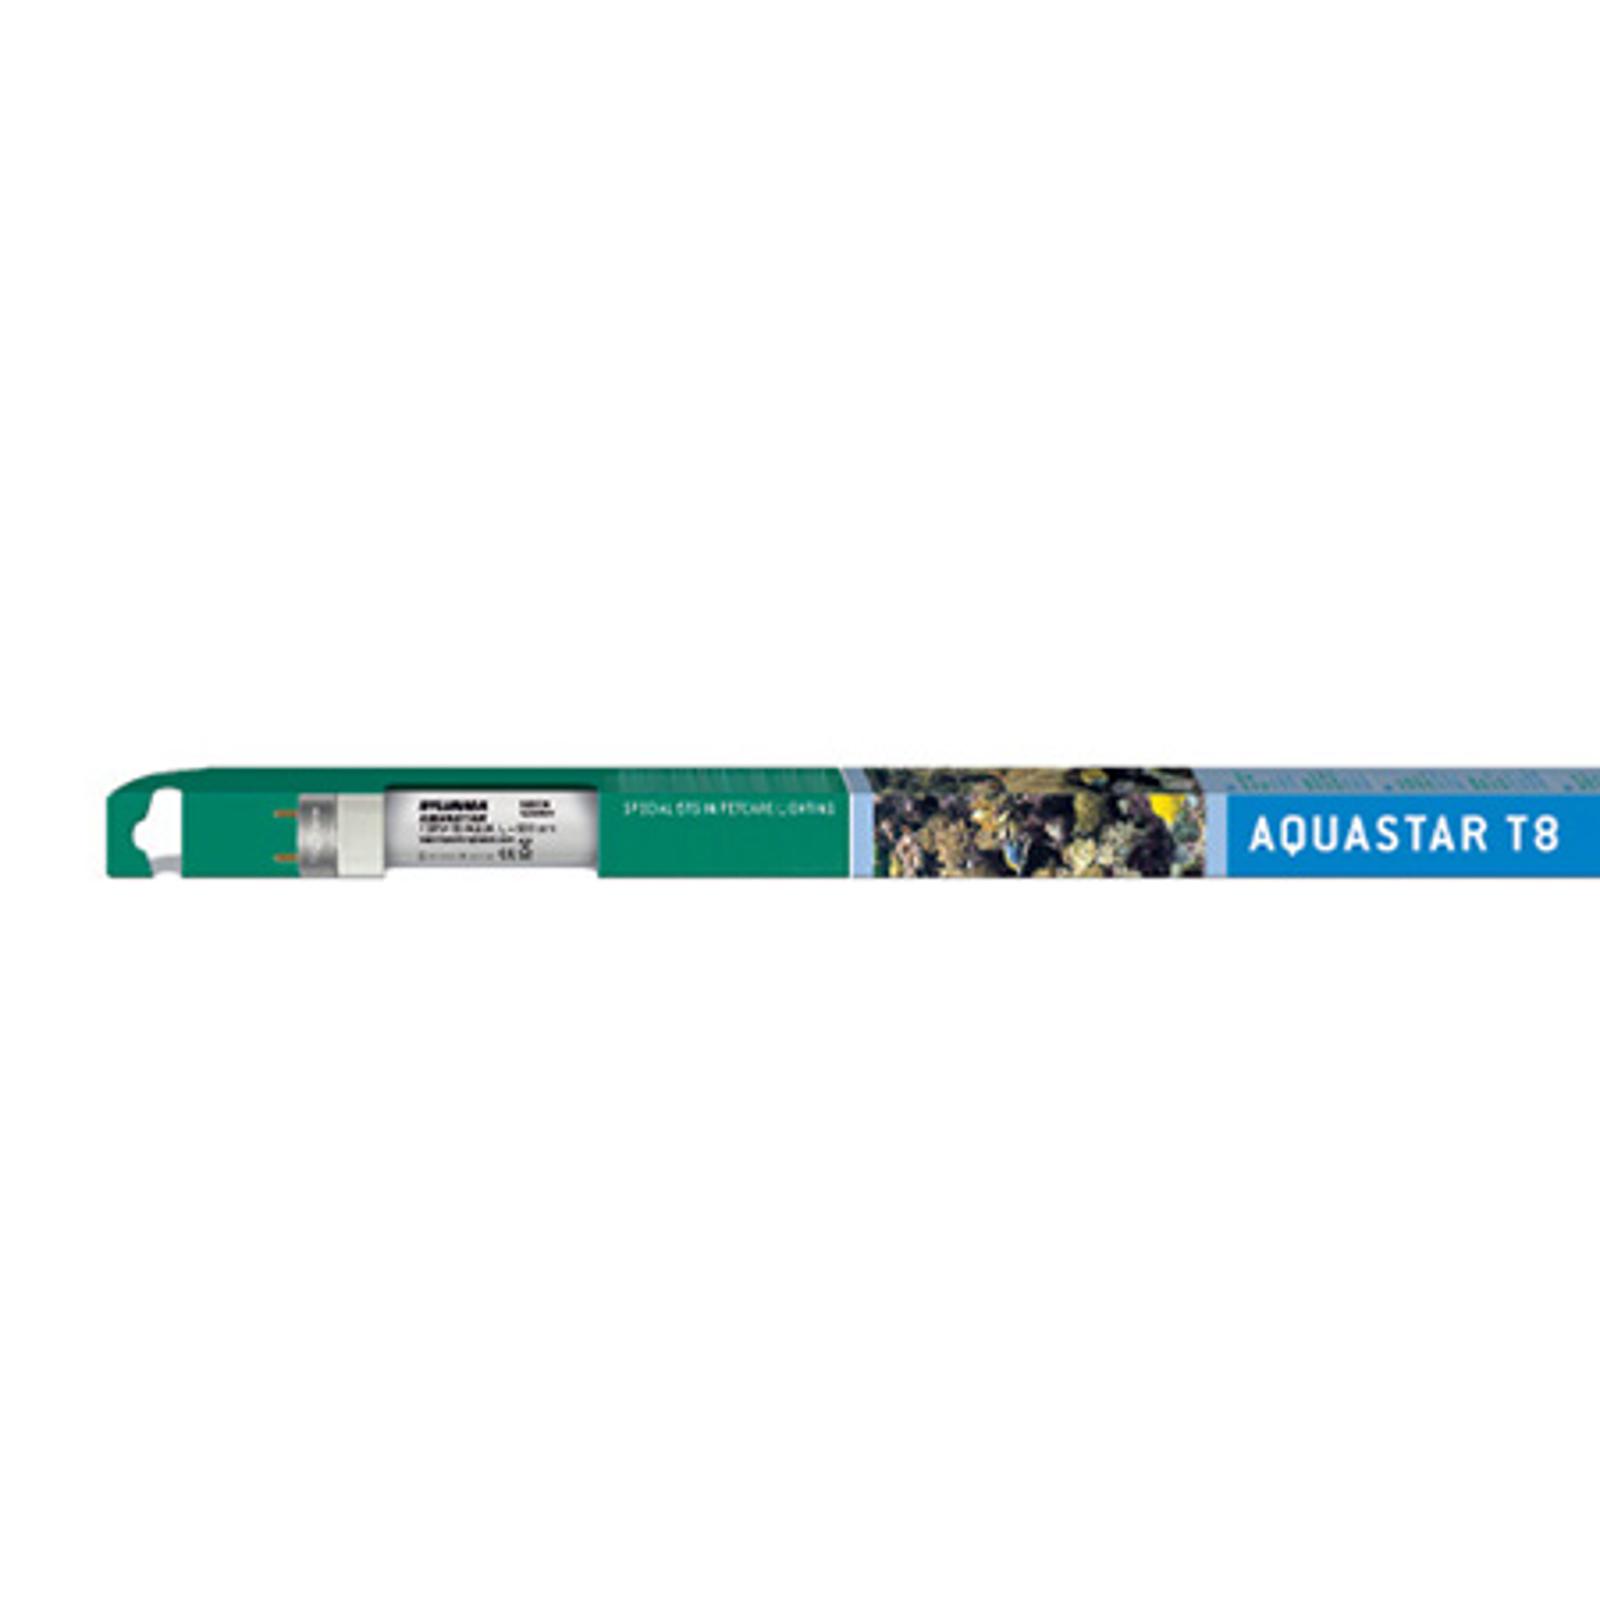 G13 T8 25 W Aquastar-päivänvalolamppu